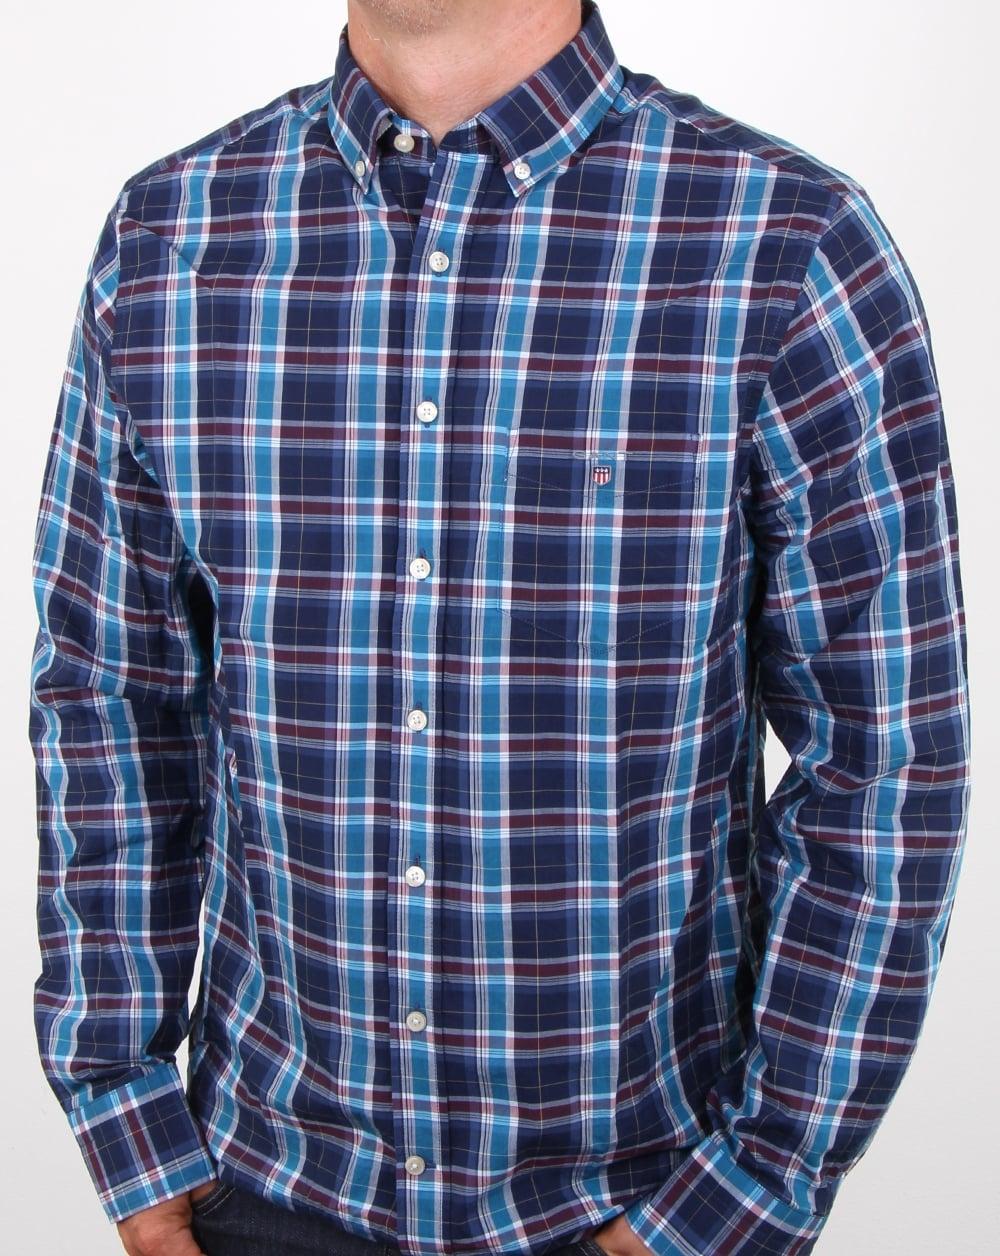 d4f65085d0a Gant Gant Broadcloth Check Shirt Dark Indigo